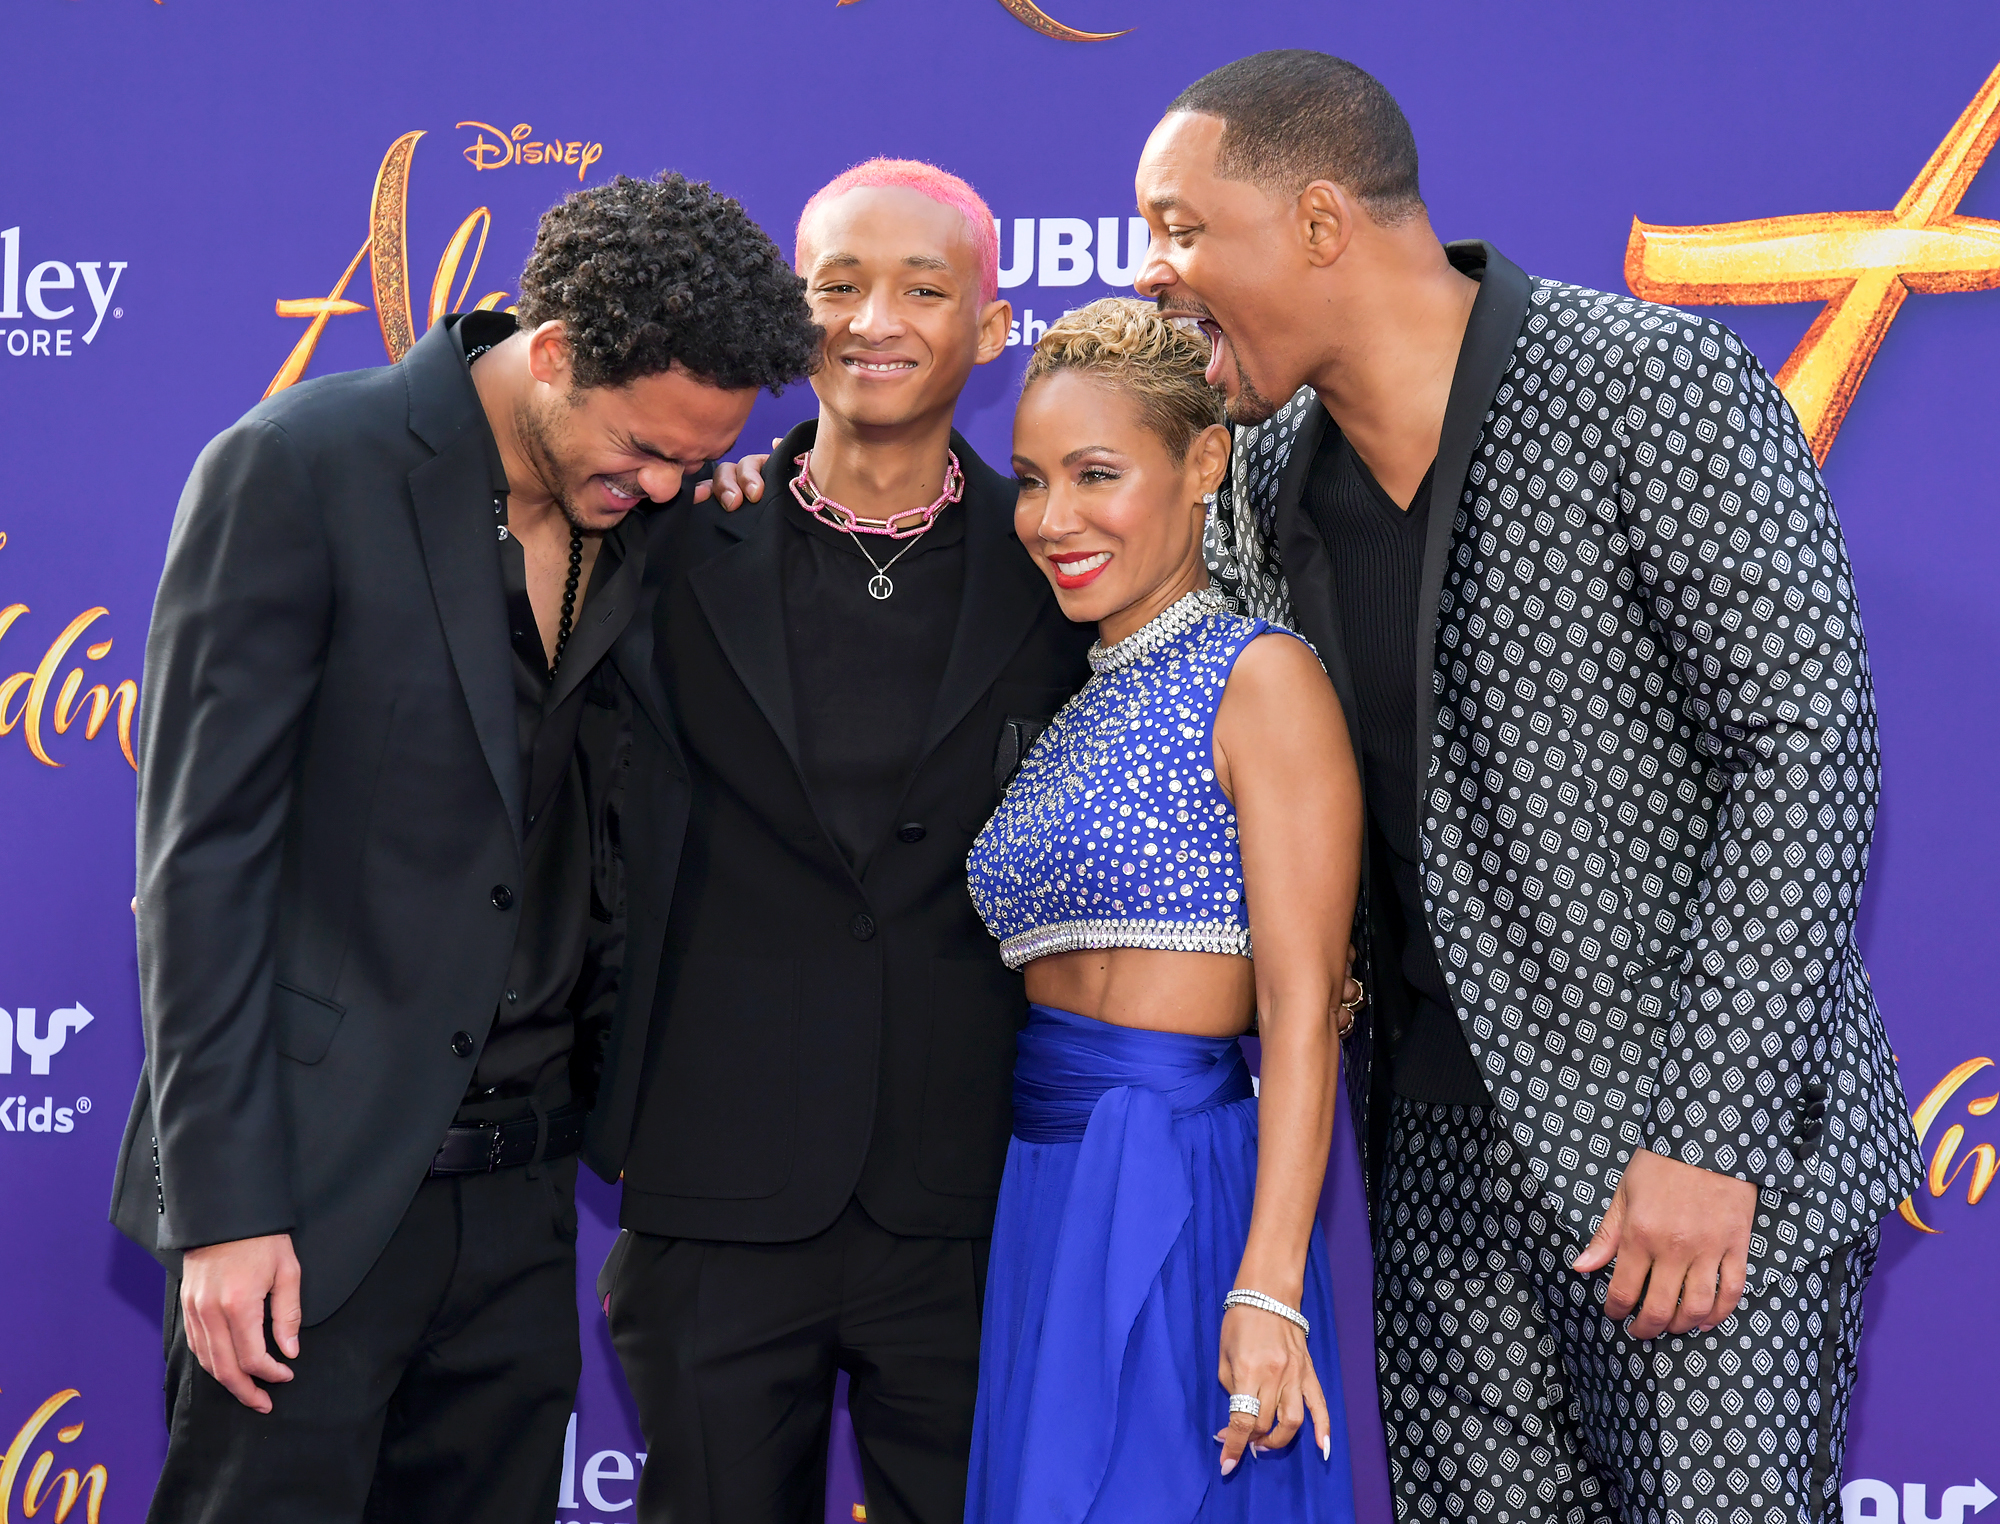 Trey-Smith,-Jaden-Smith,-Jada-Pinkett-Smith,-and-Will-Smith-Aladdin-premiere - Trey cracked up on the carpet while posing with Will, Jaden and Jada.